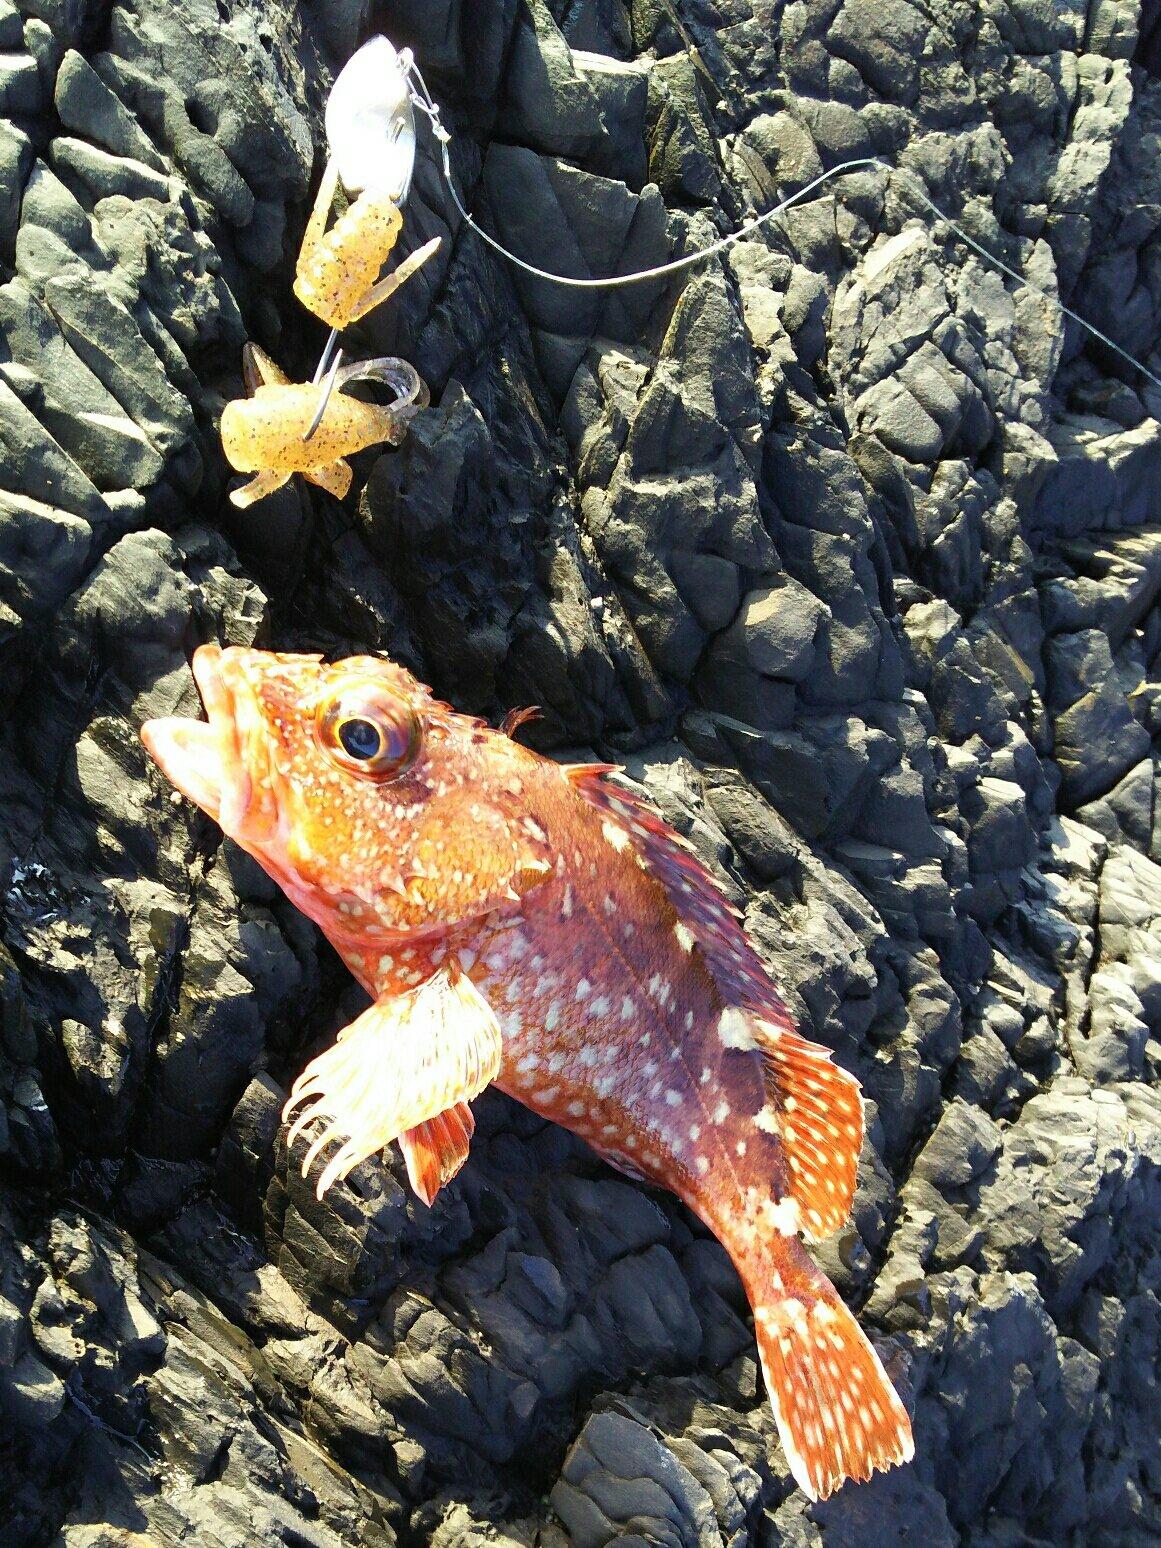 Deandre6さんの投稿画像,写っている魚はカサゴ